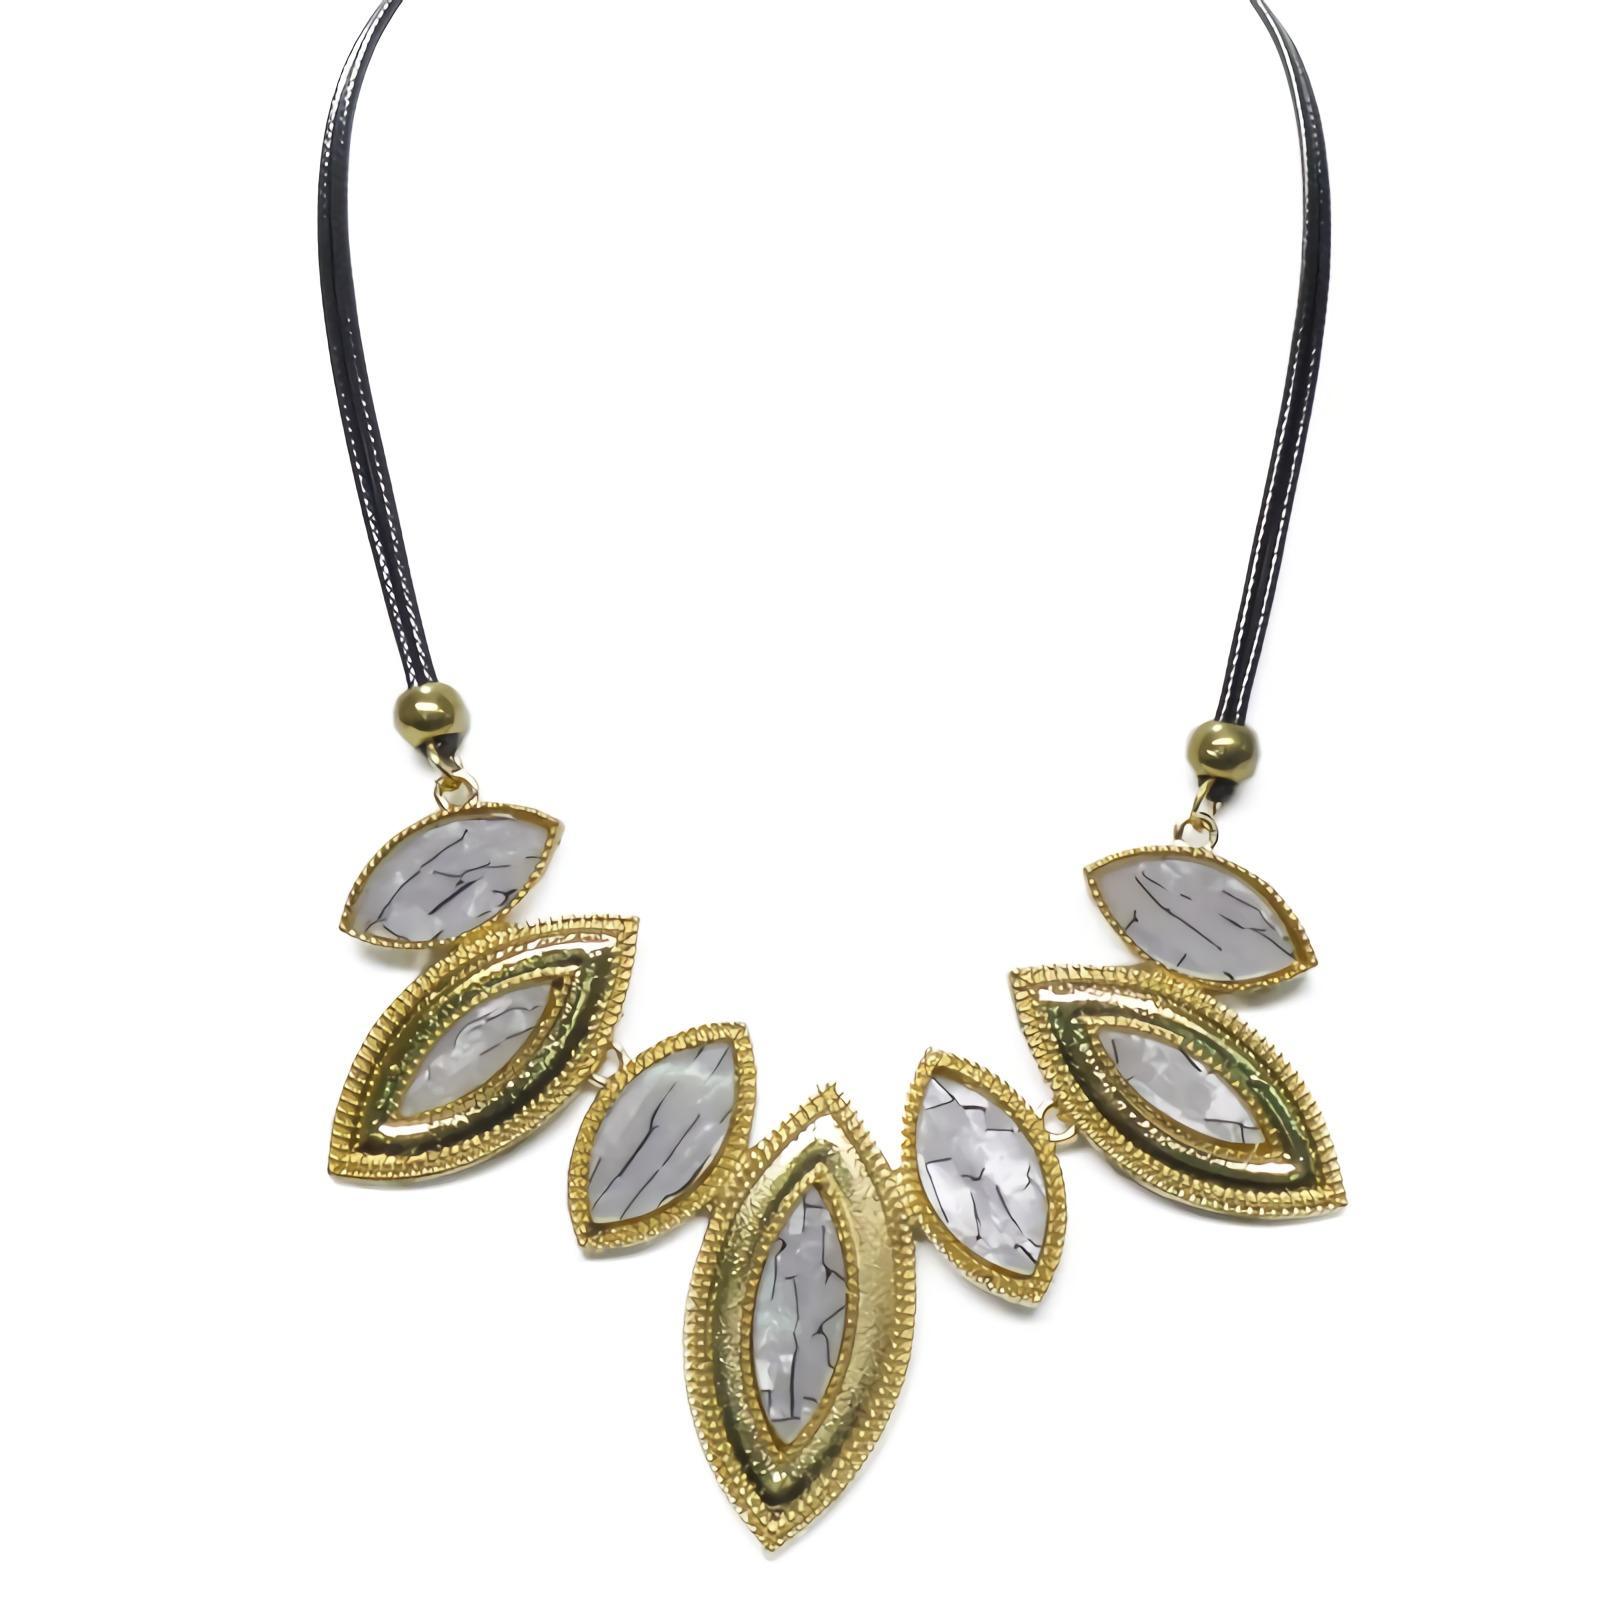 Ofashion Aksesoris Kalung Xx Ca 1702k020 Modern Necklace Accessories Source · OFASHION Aksesoris Kalung CA 180314